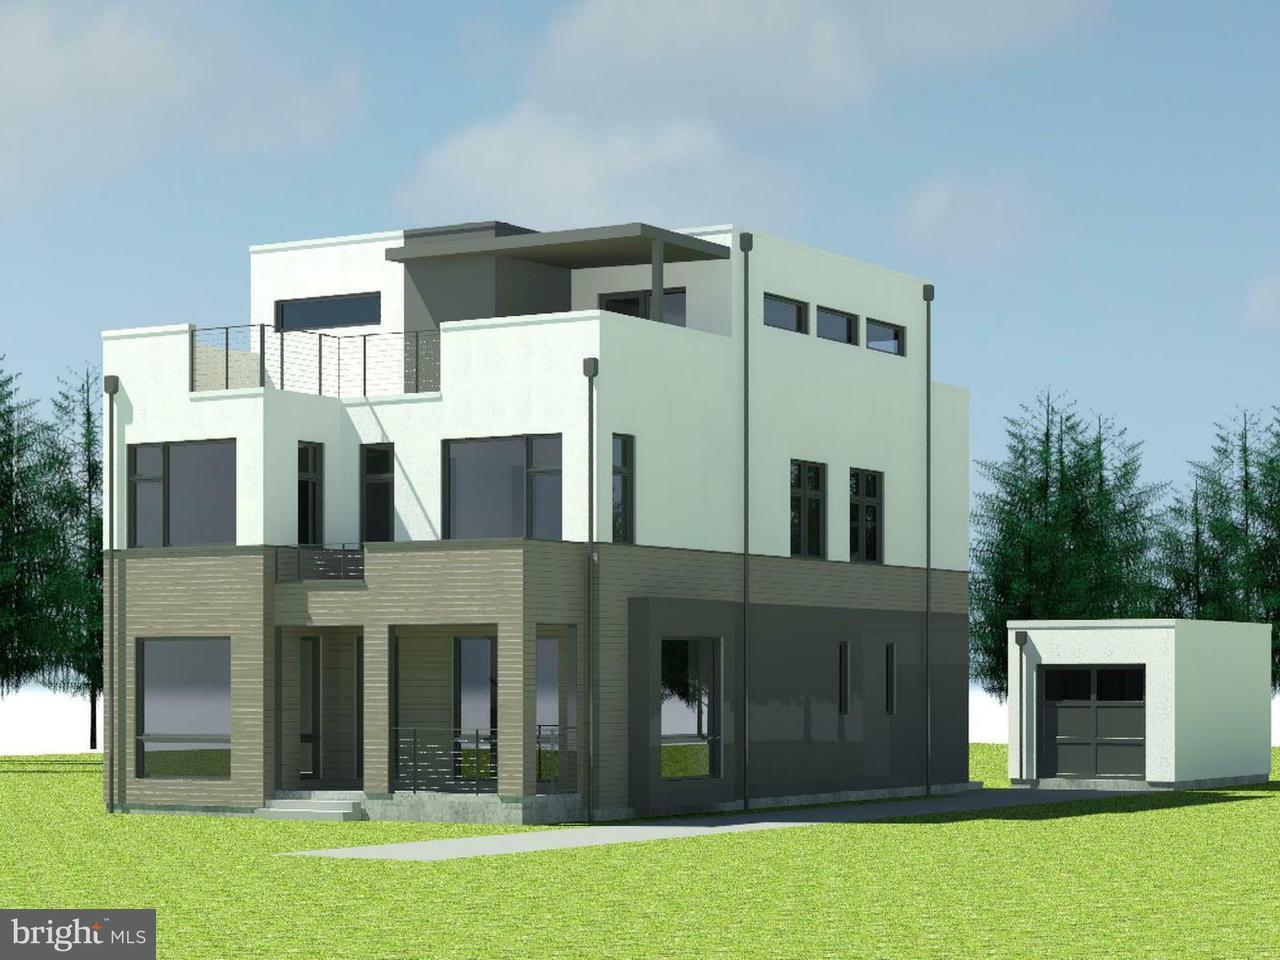 Single Family Home for Sale at 1403 Highland St N 1403 Highland St N Arlington, Virginia 22201 United States